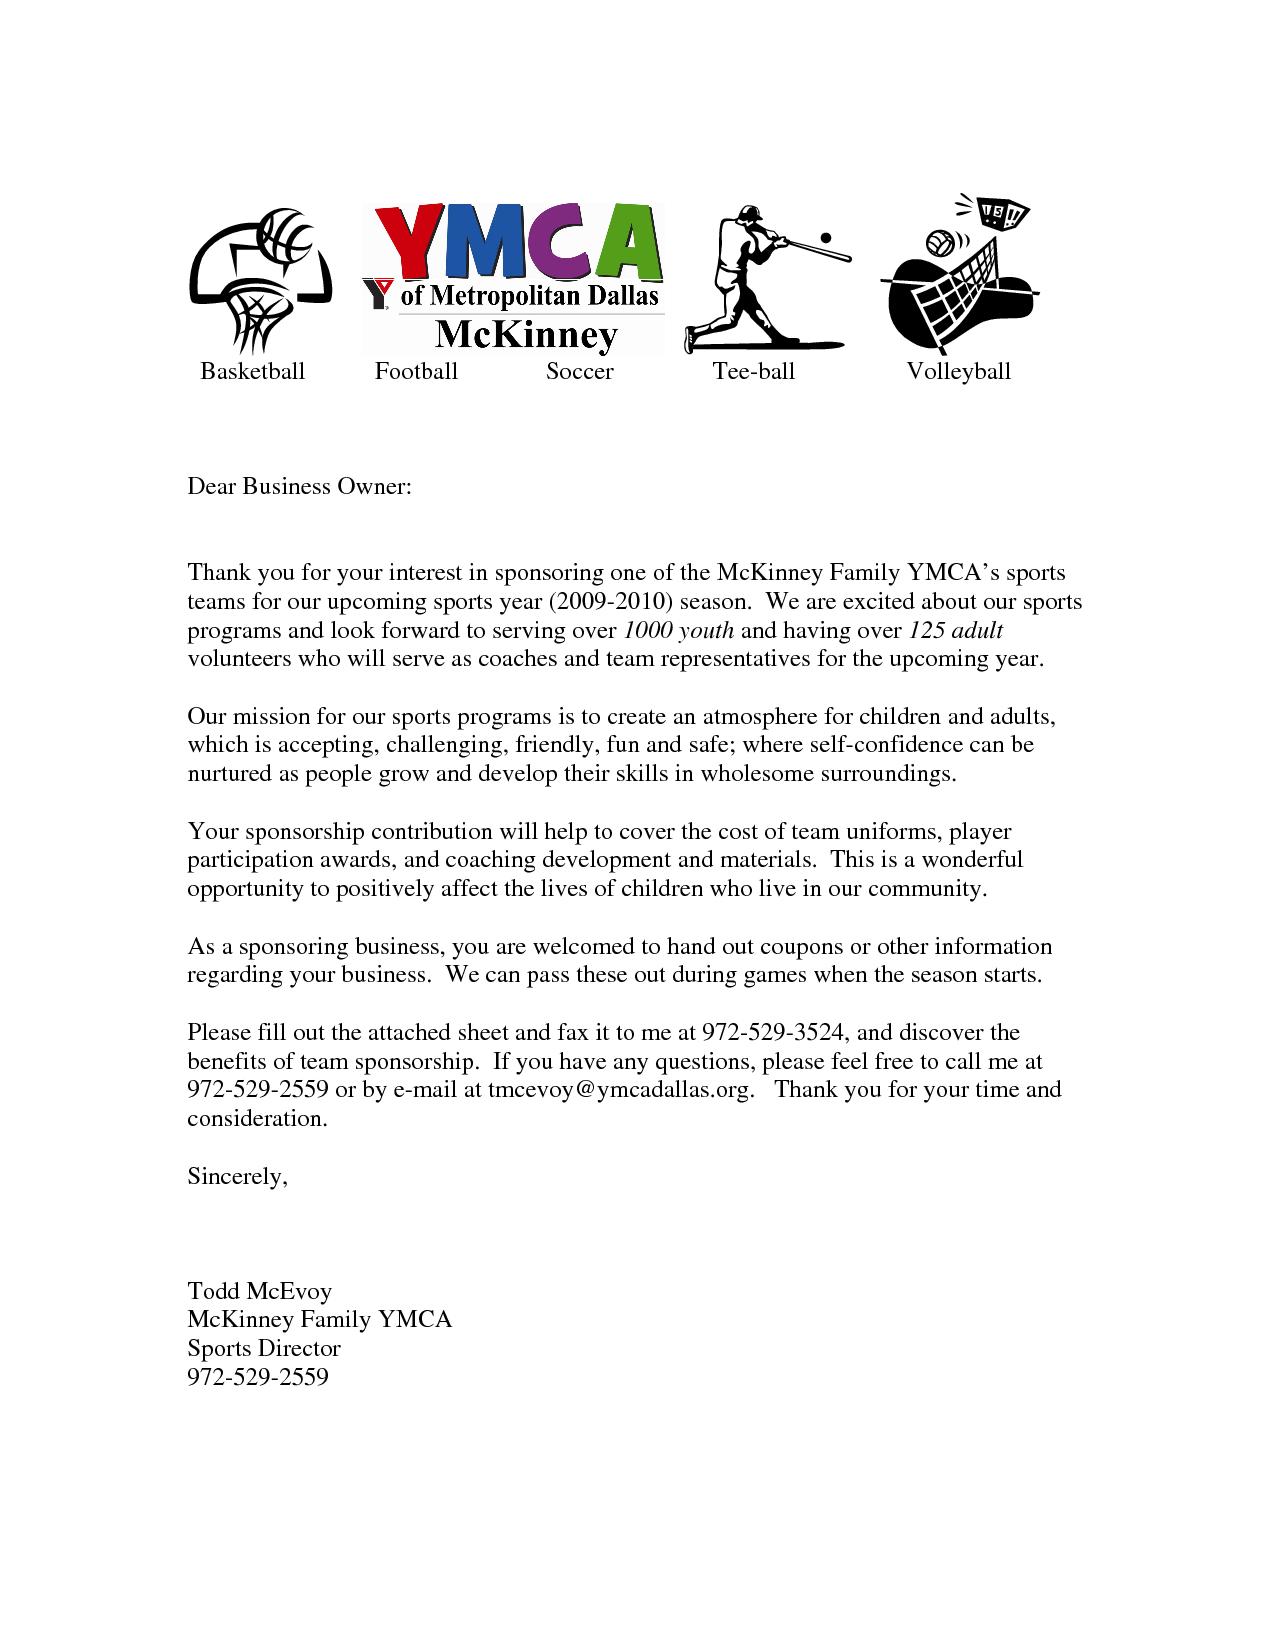 sample sponsorship request letter for youth sports team  letters for sports teams youth sponsorship letter team ..